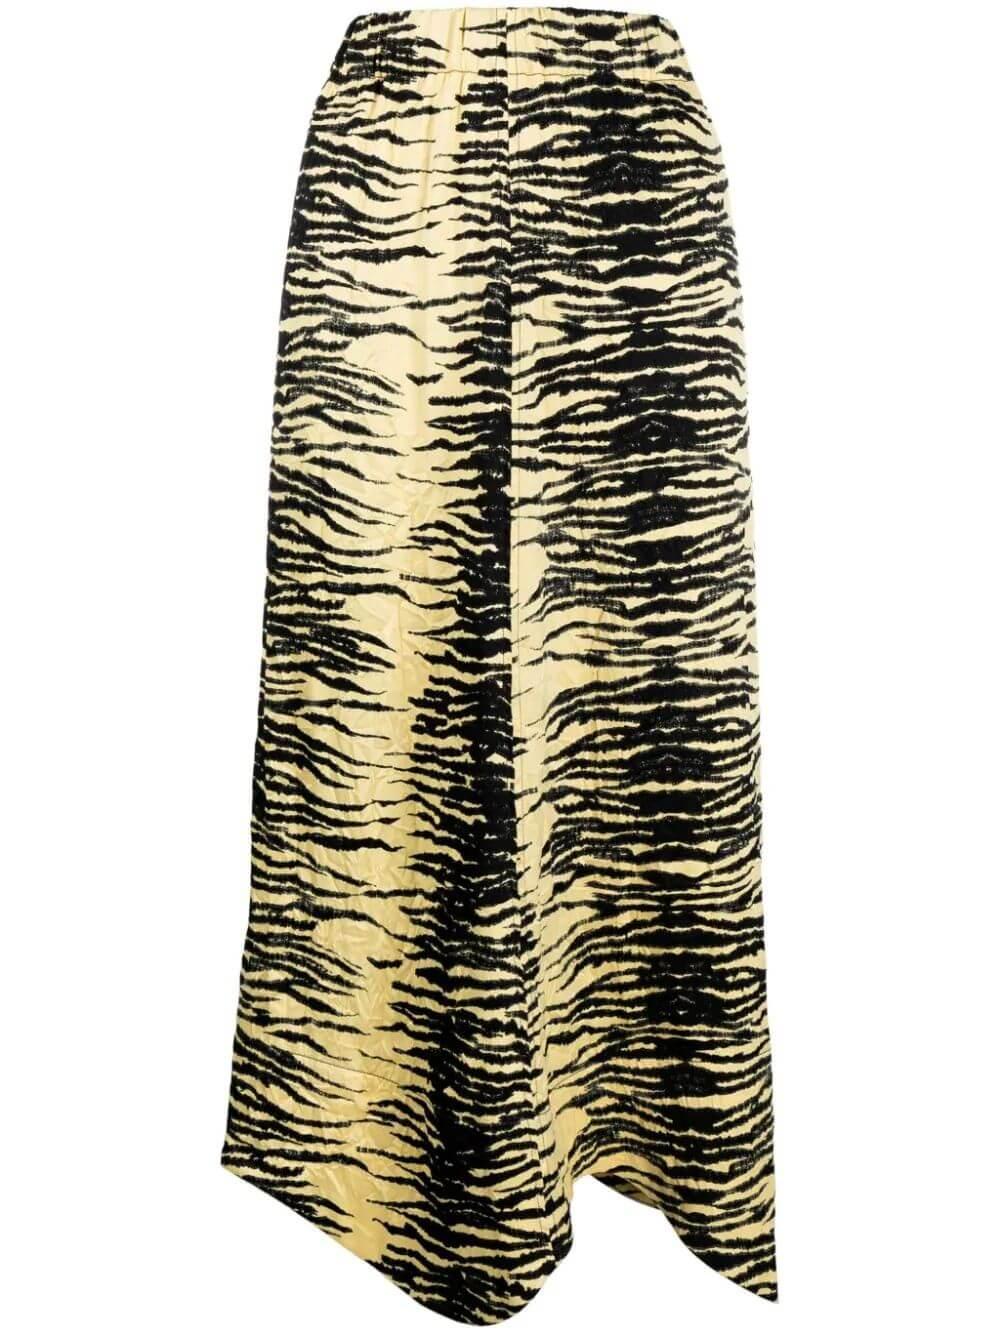 Crinkled Satin Printed Midi Skirt Item # F6111